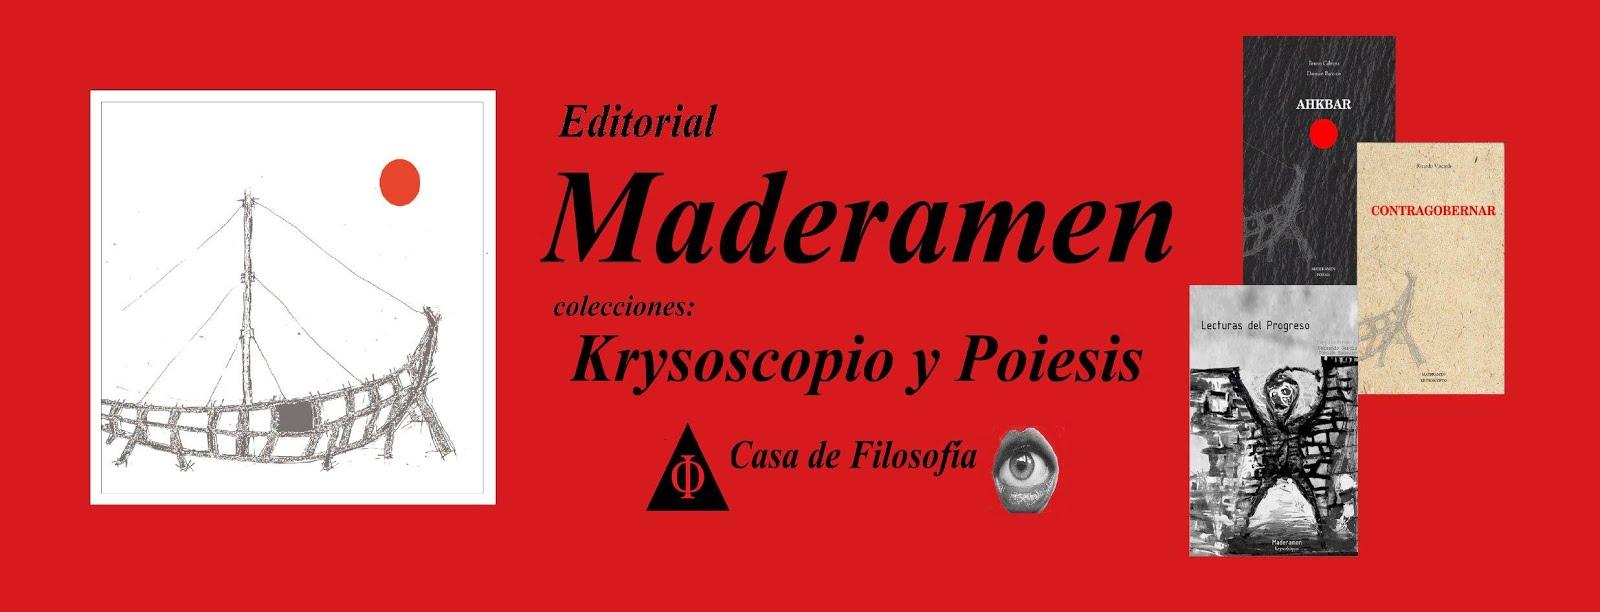 Editorial Maderamen